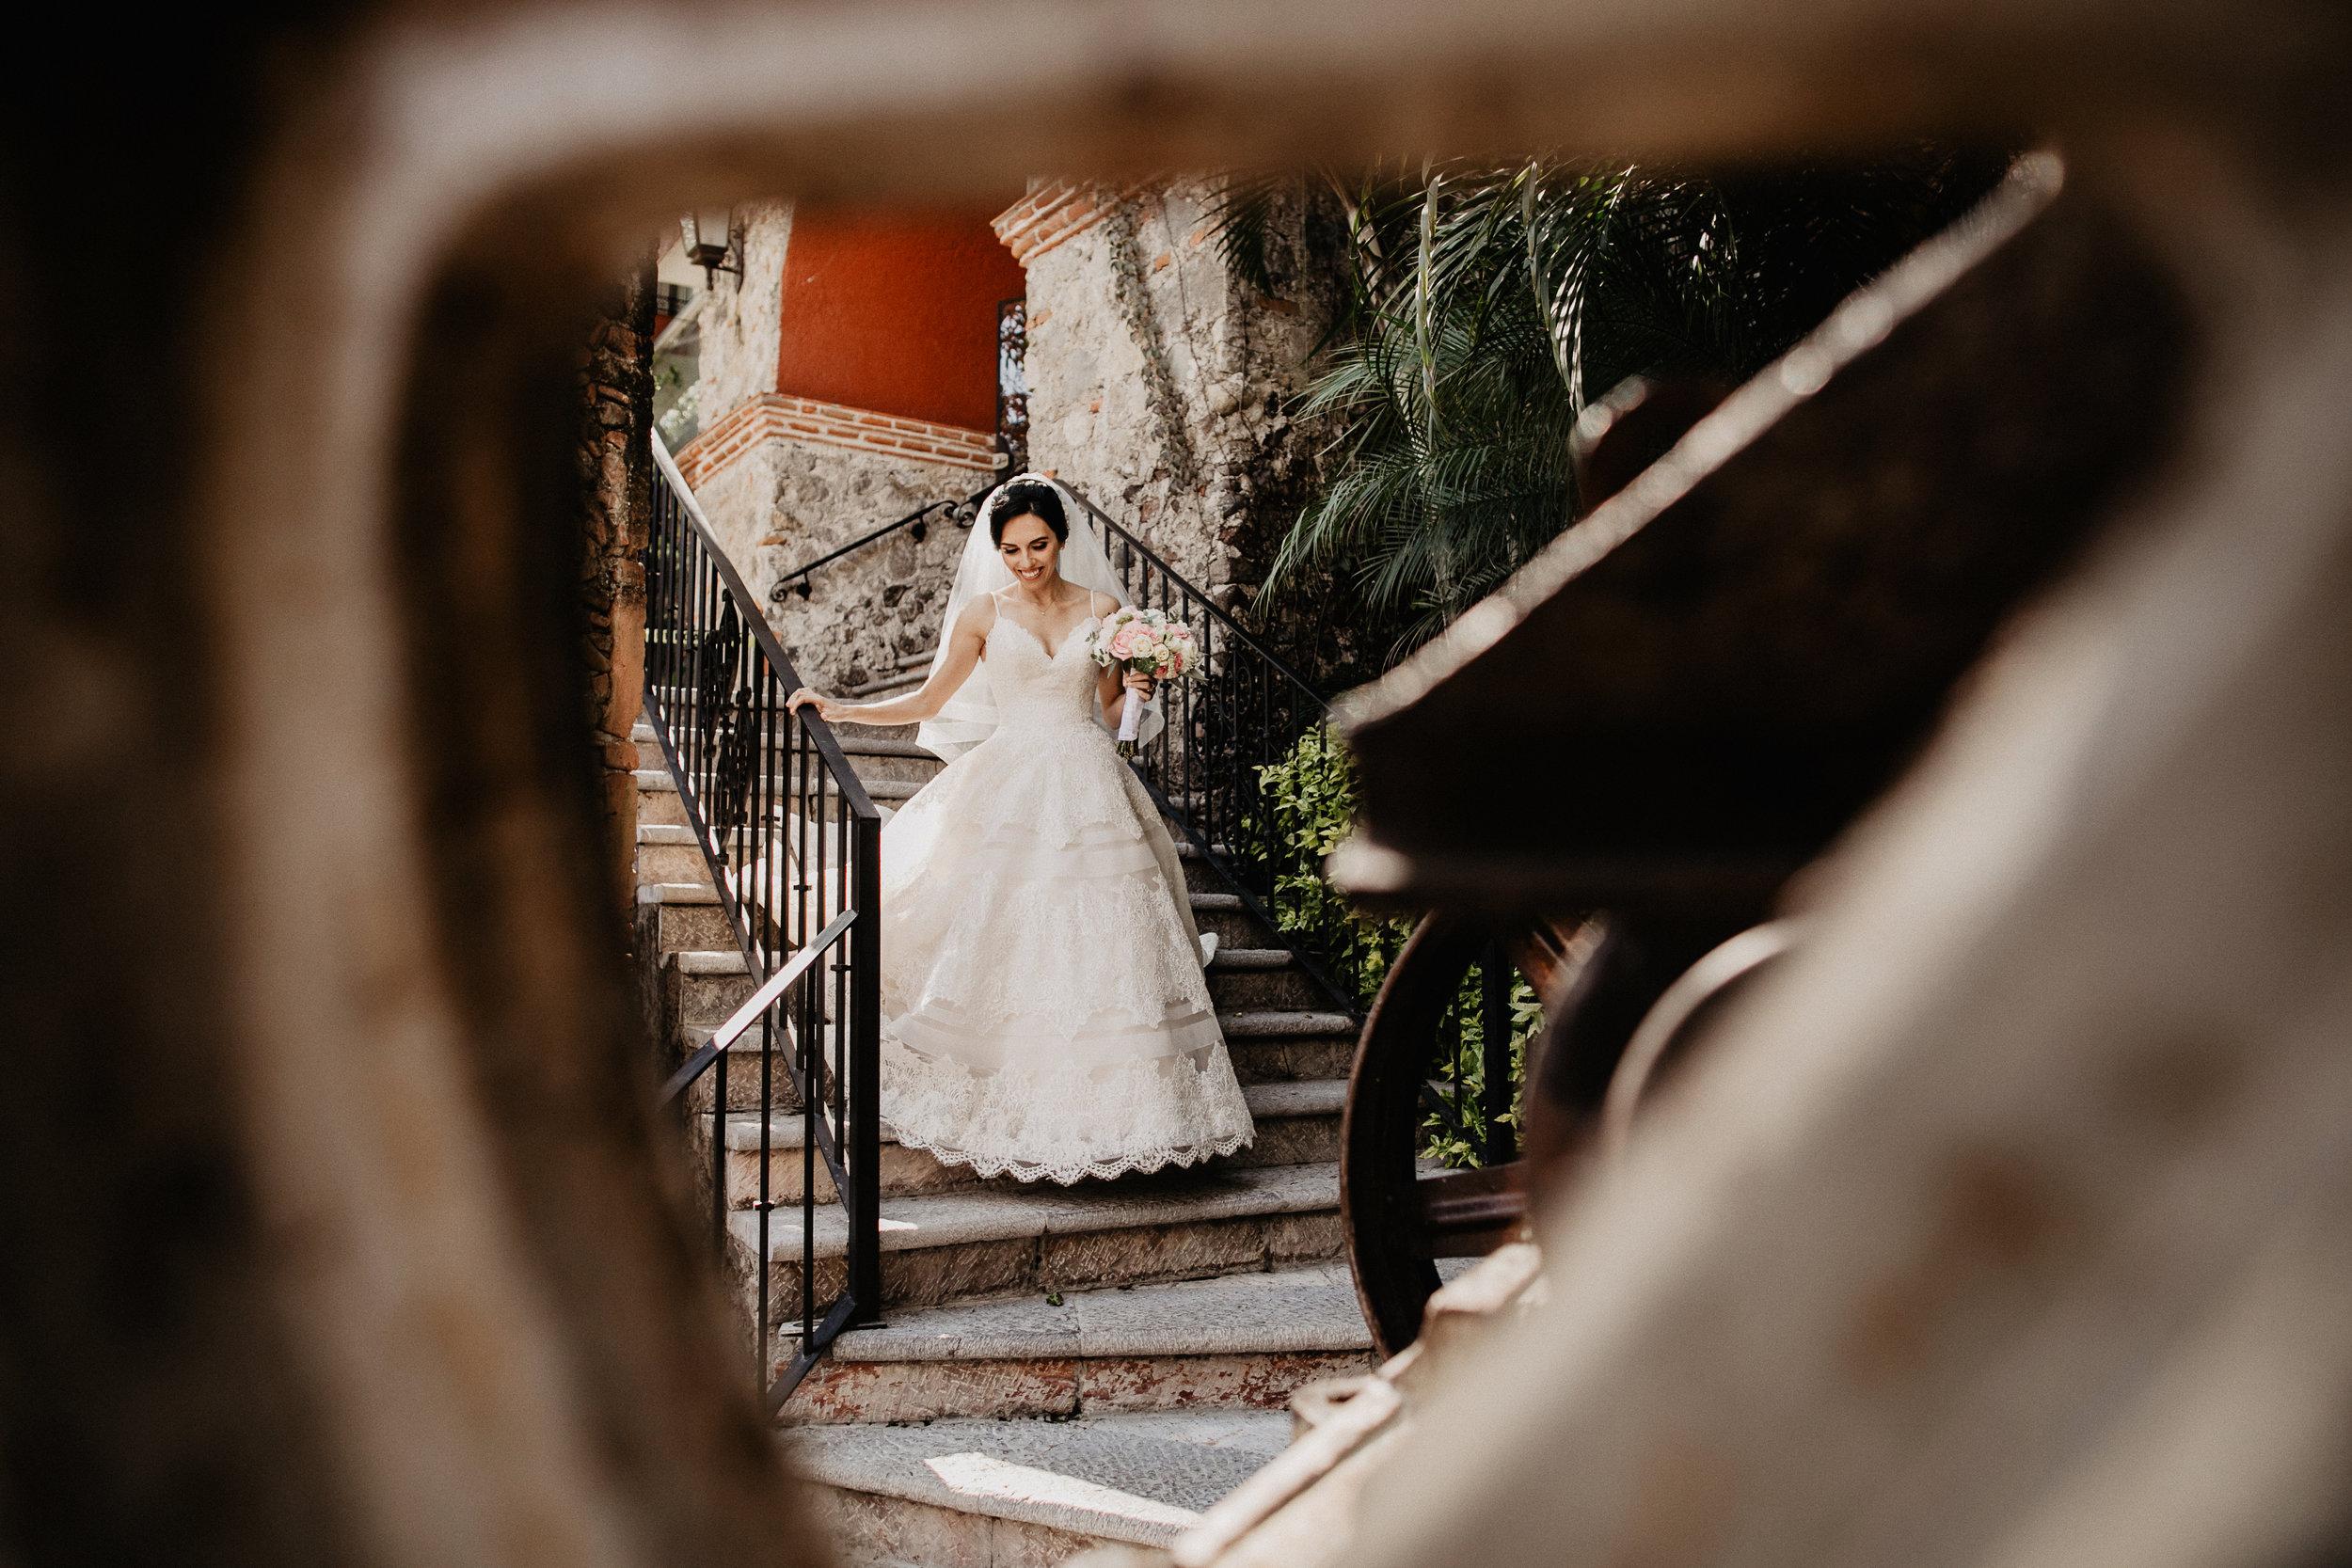 Alfonso_flores_destination_wedding_photography_vanesa_carlos-267.JPG